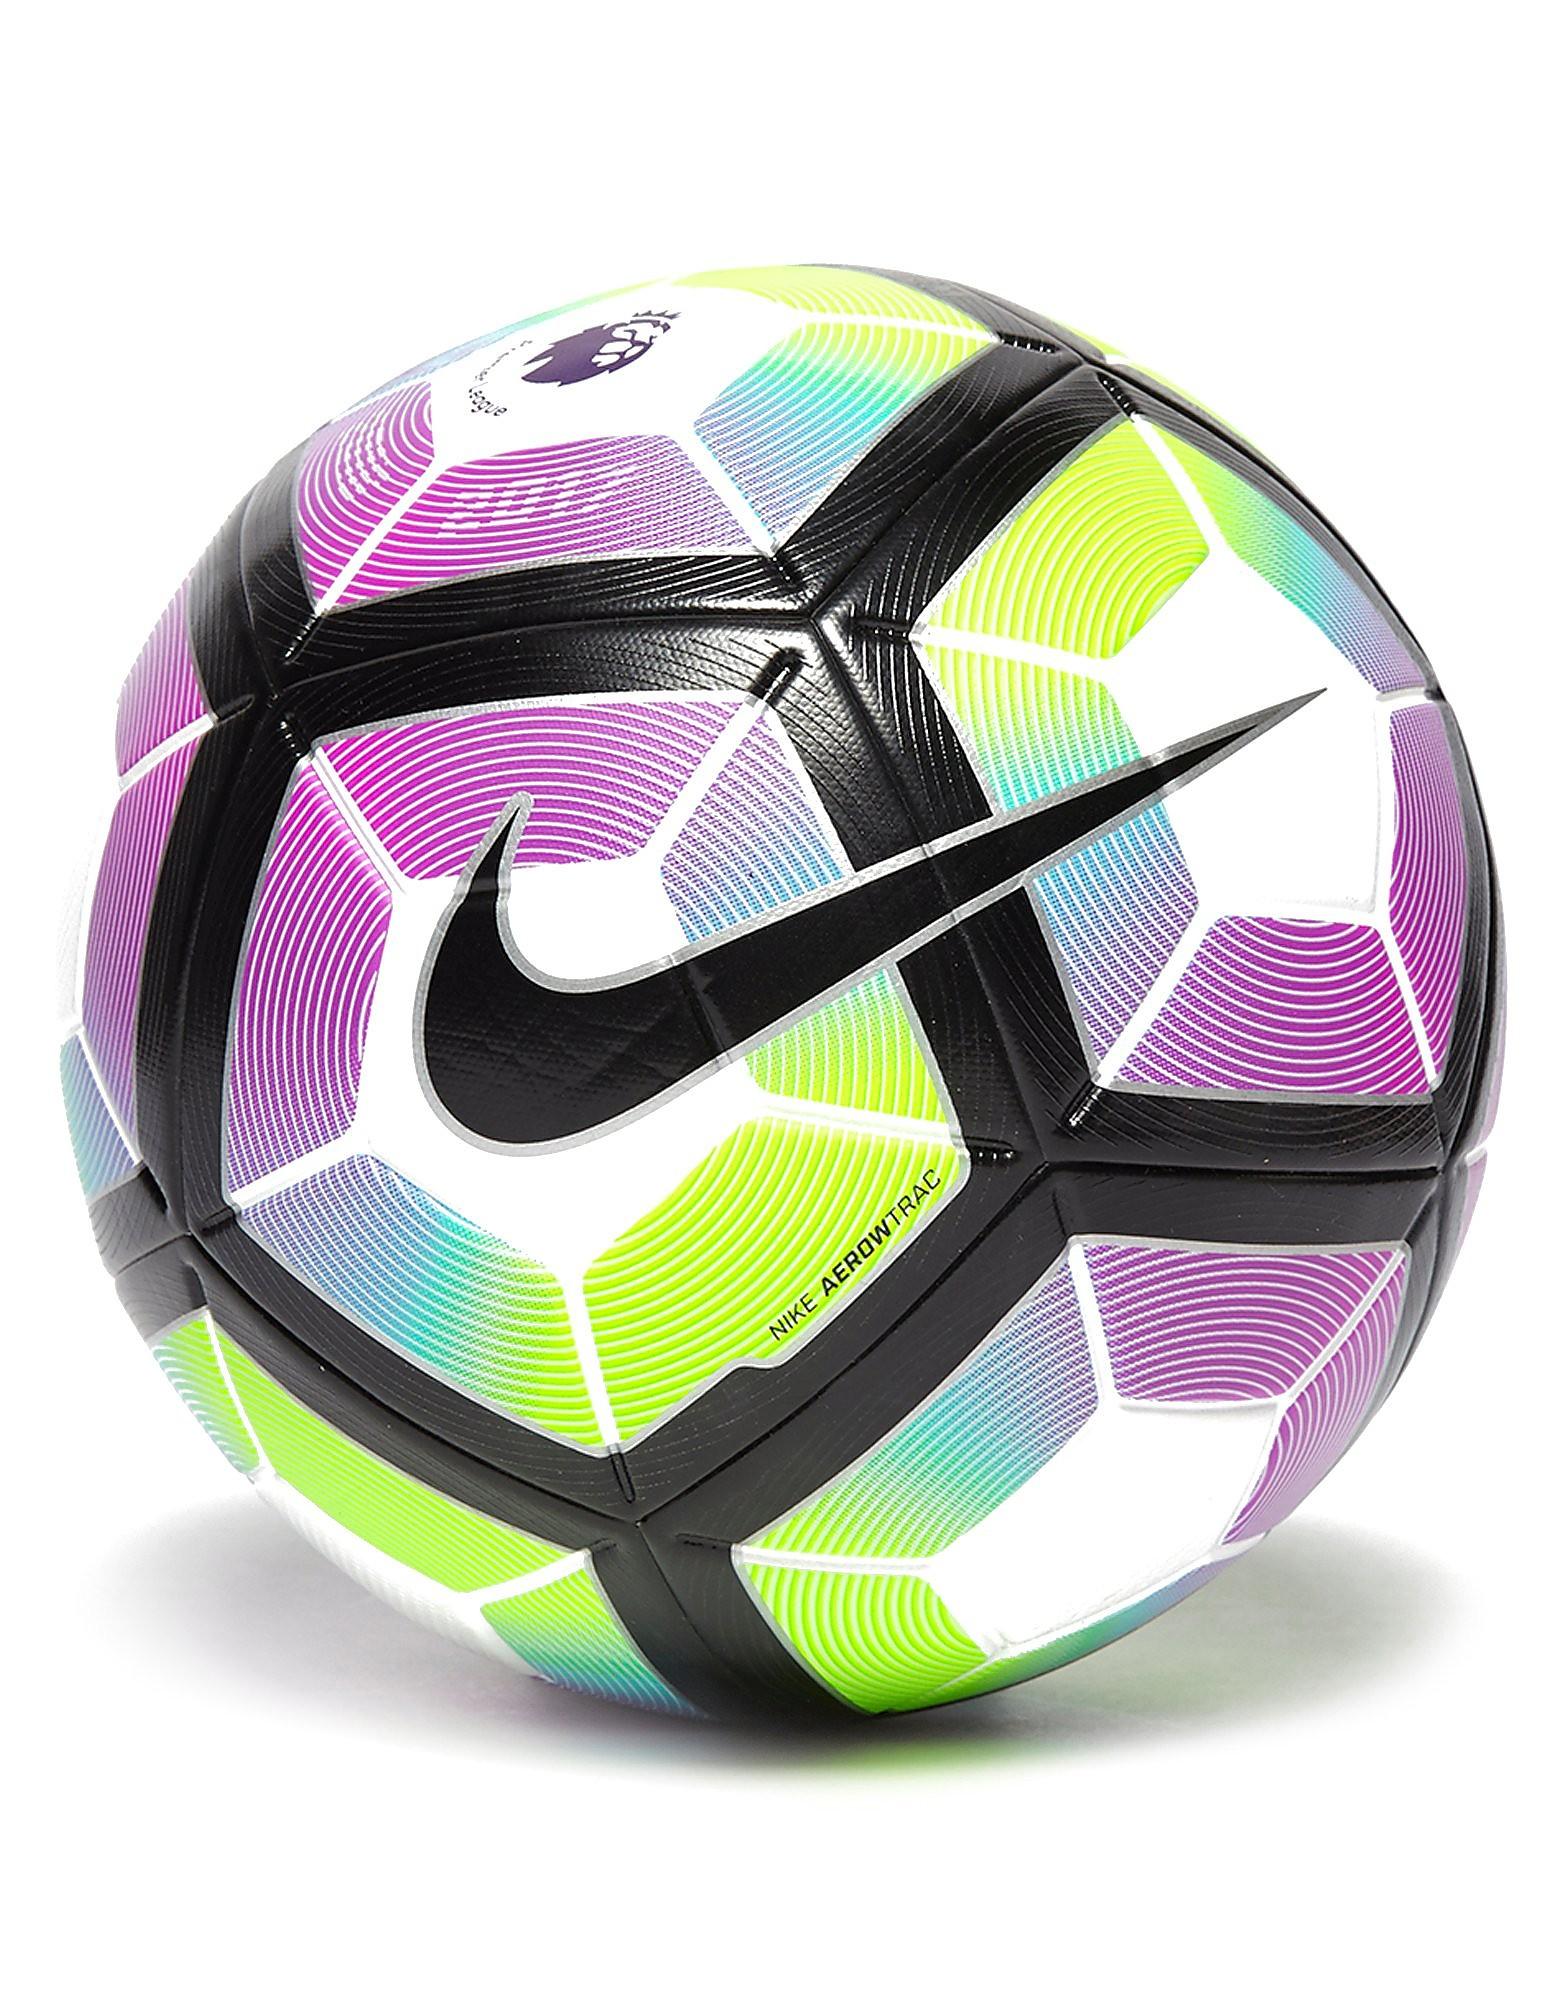 Nike Ordem 4 Premier League 2016/17 Fußball